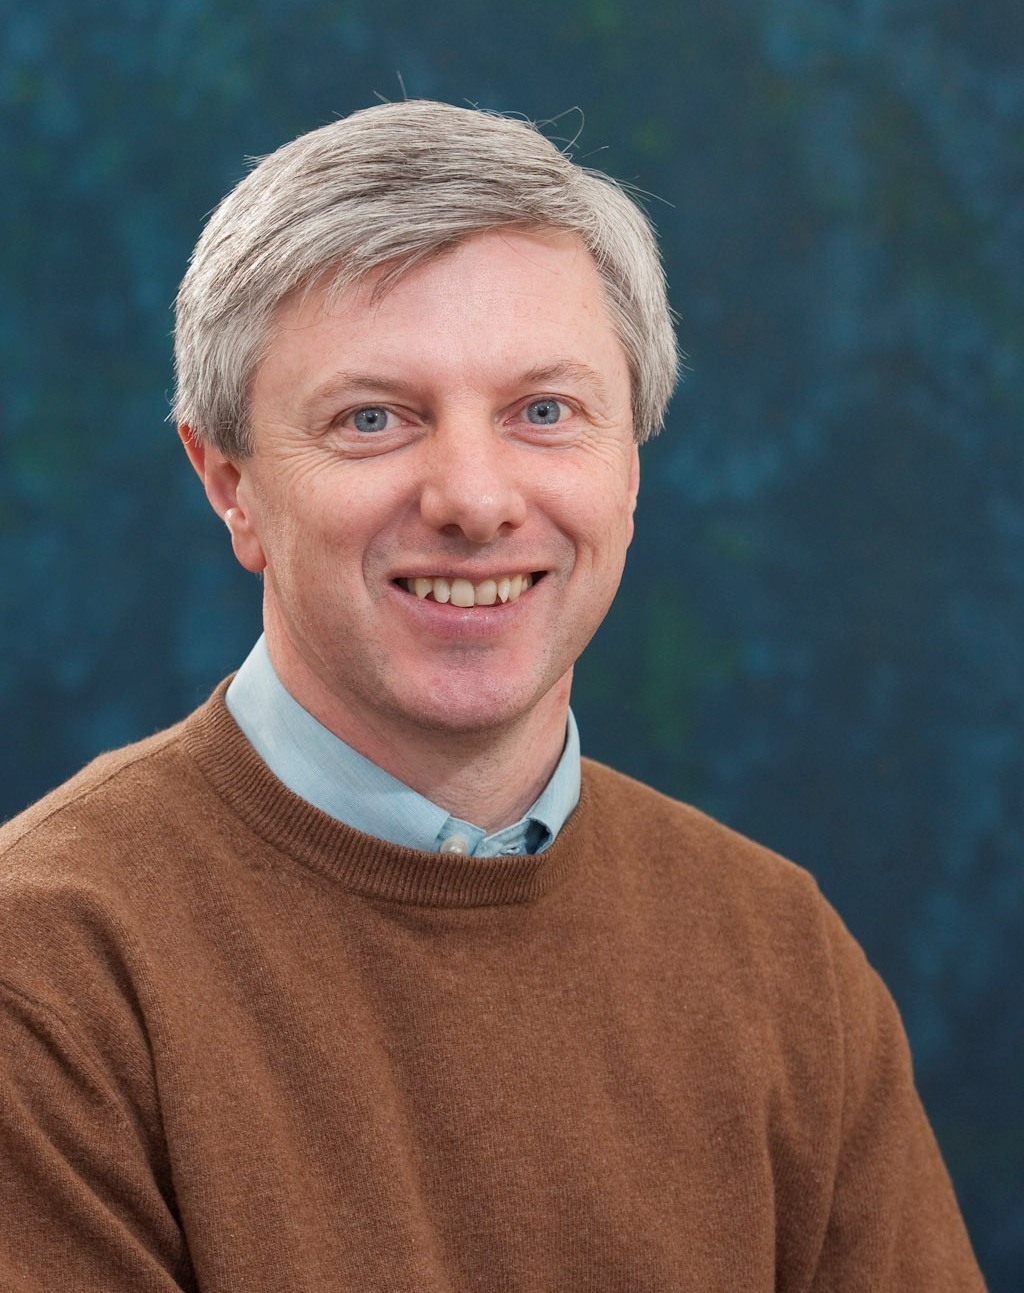 Dr. Thomas Carroll